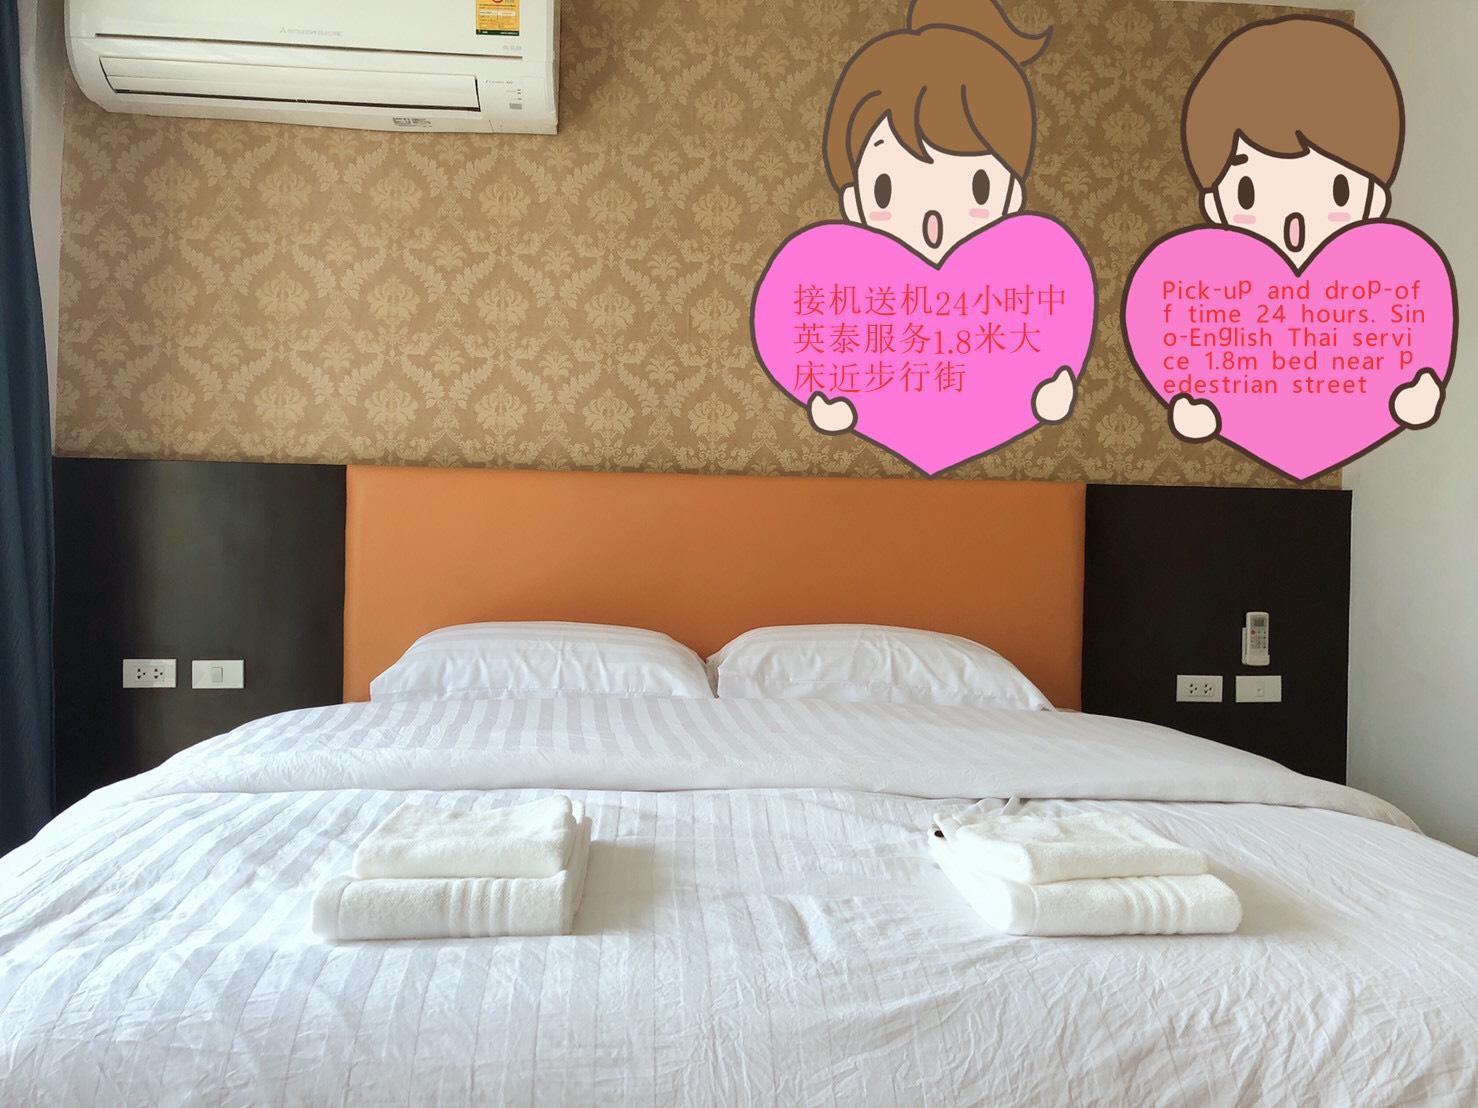 1.8m Double Room 36m2 Large Room Bar Street